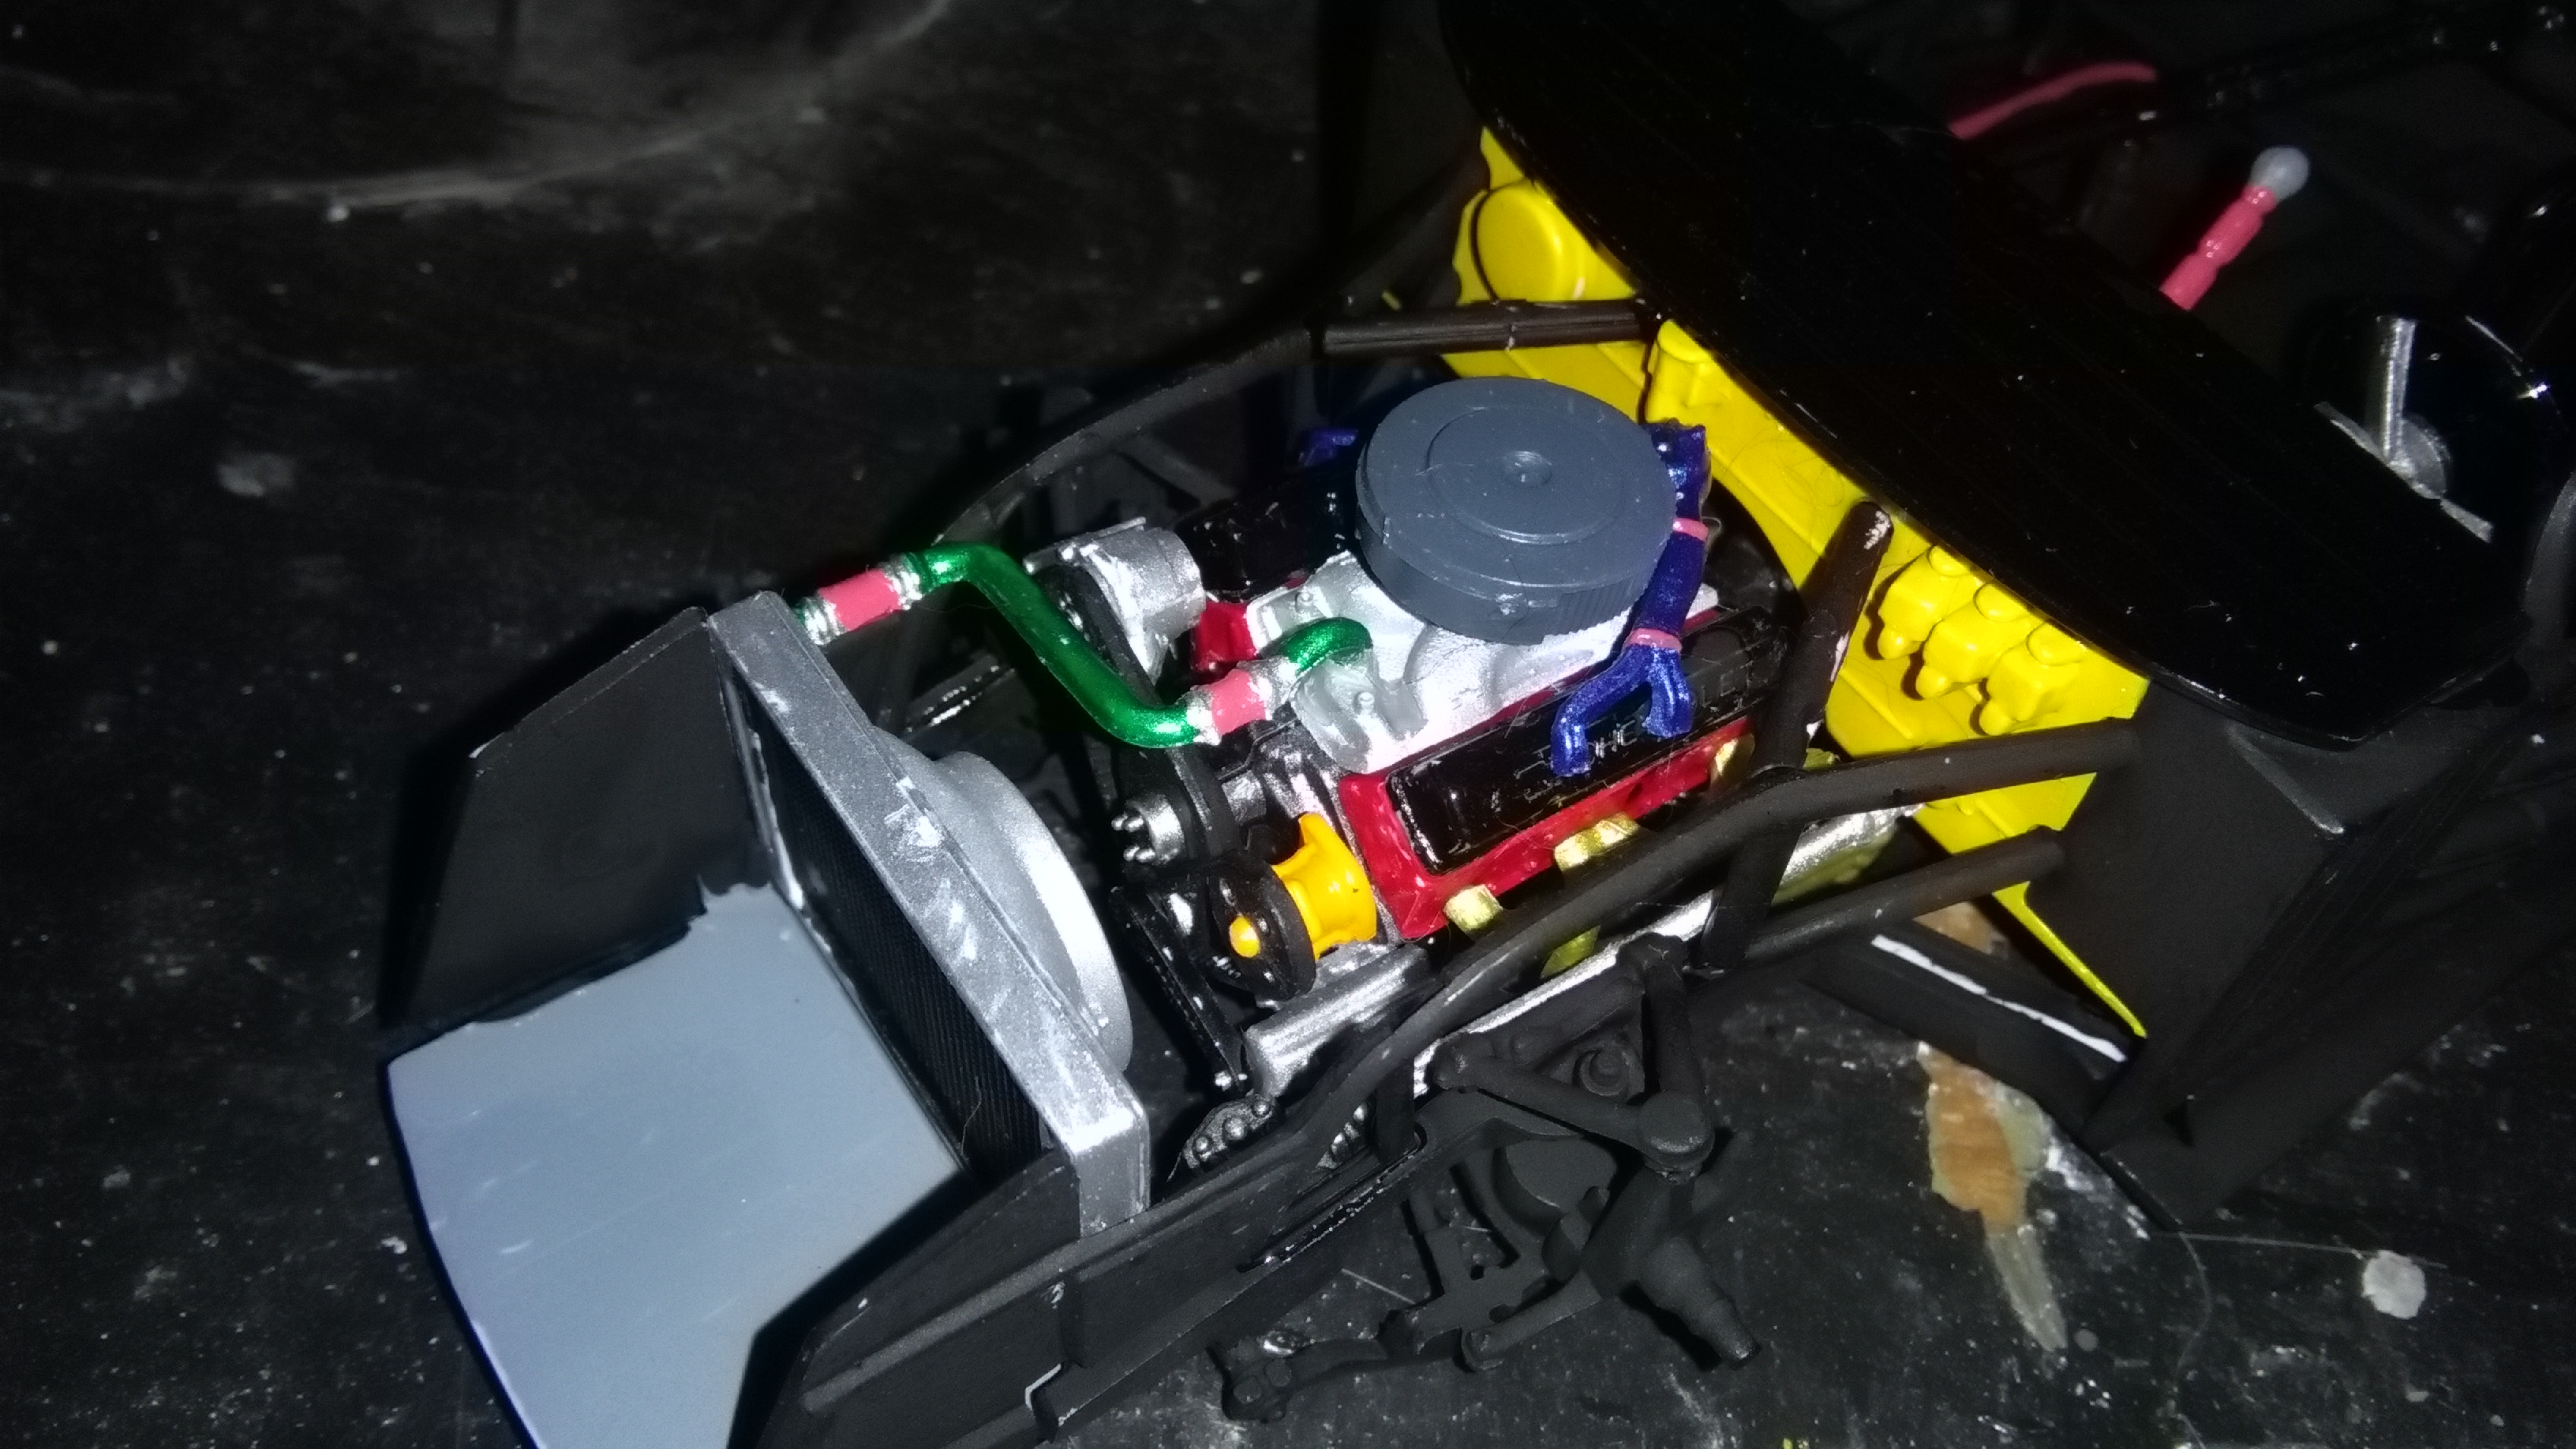 Chevy Monte-Carlo 1998 #4 Bobby Hamilton Kodak  770099C1998410